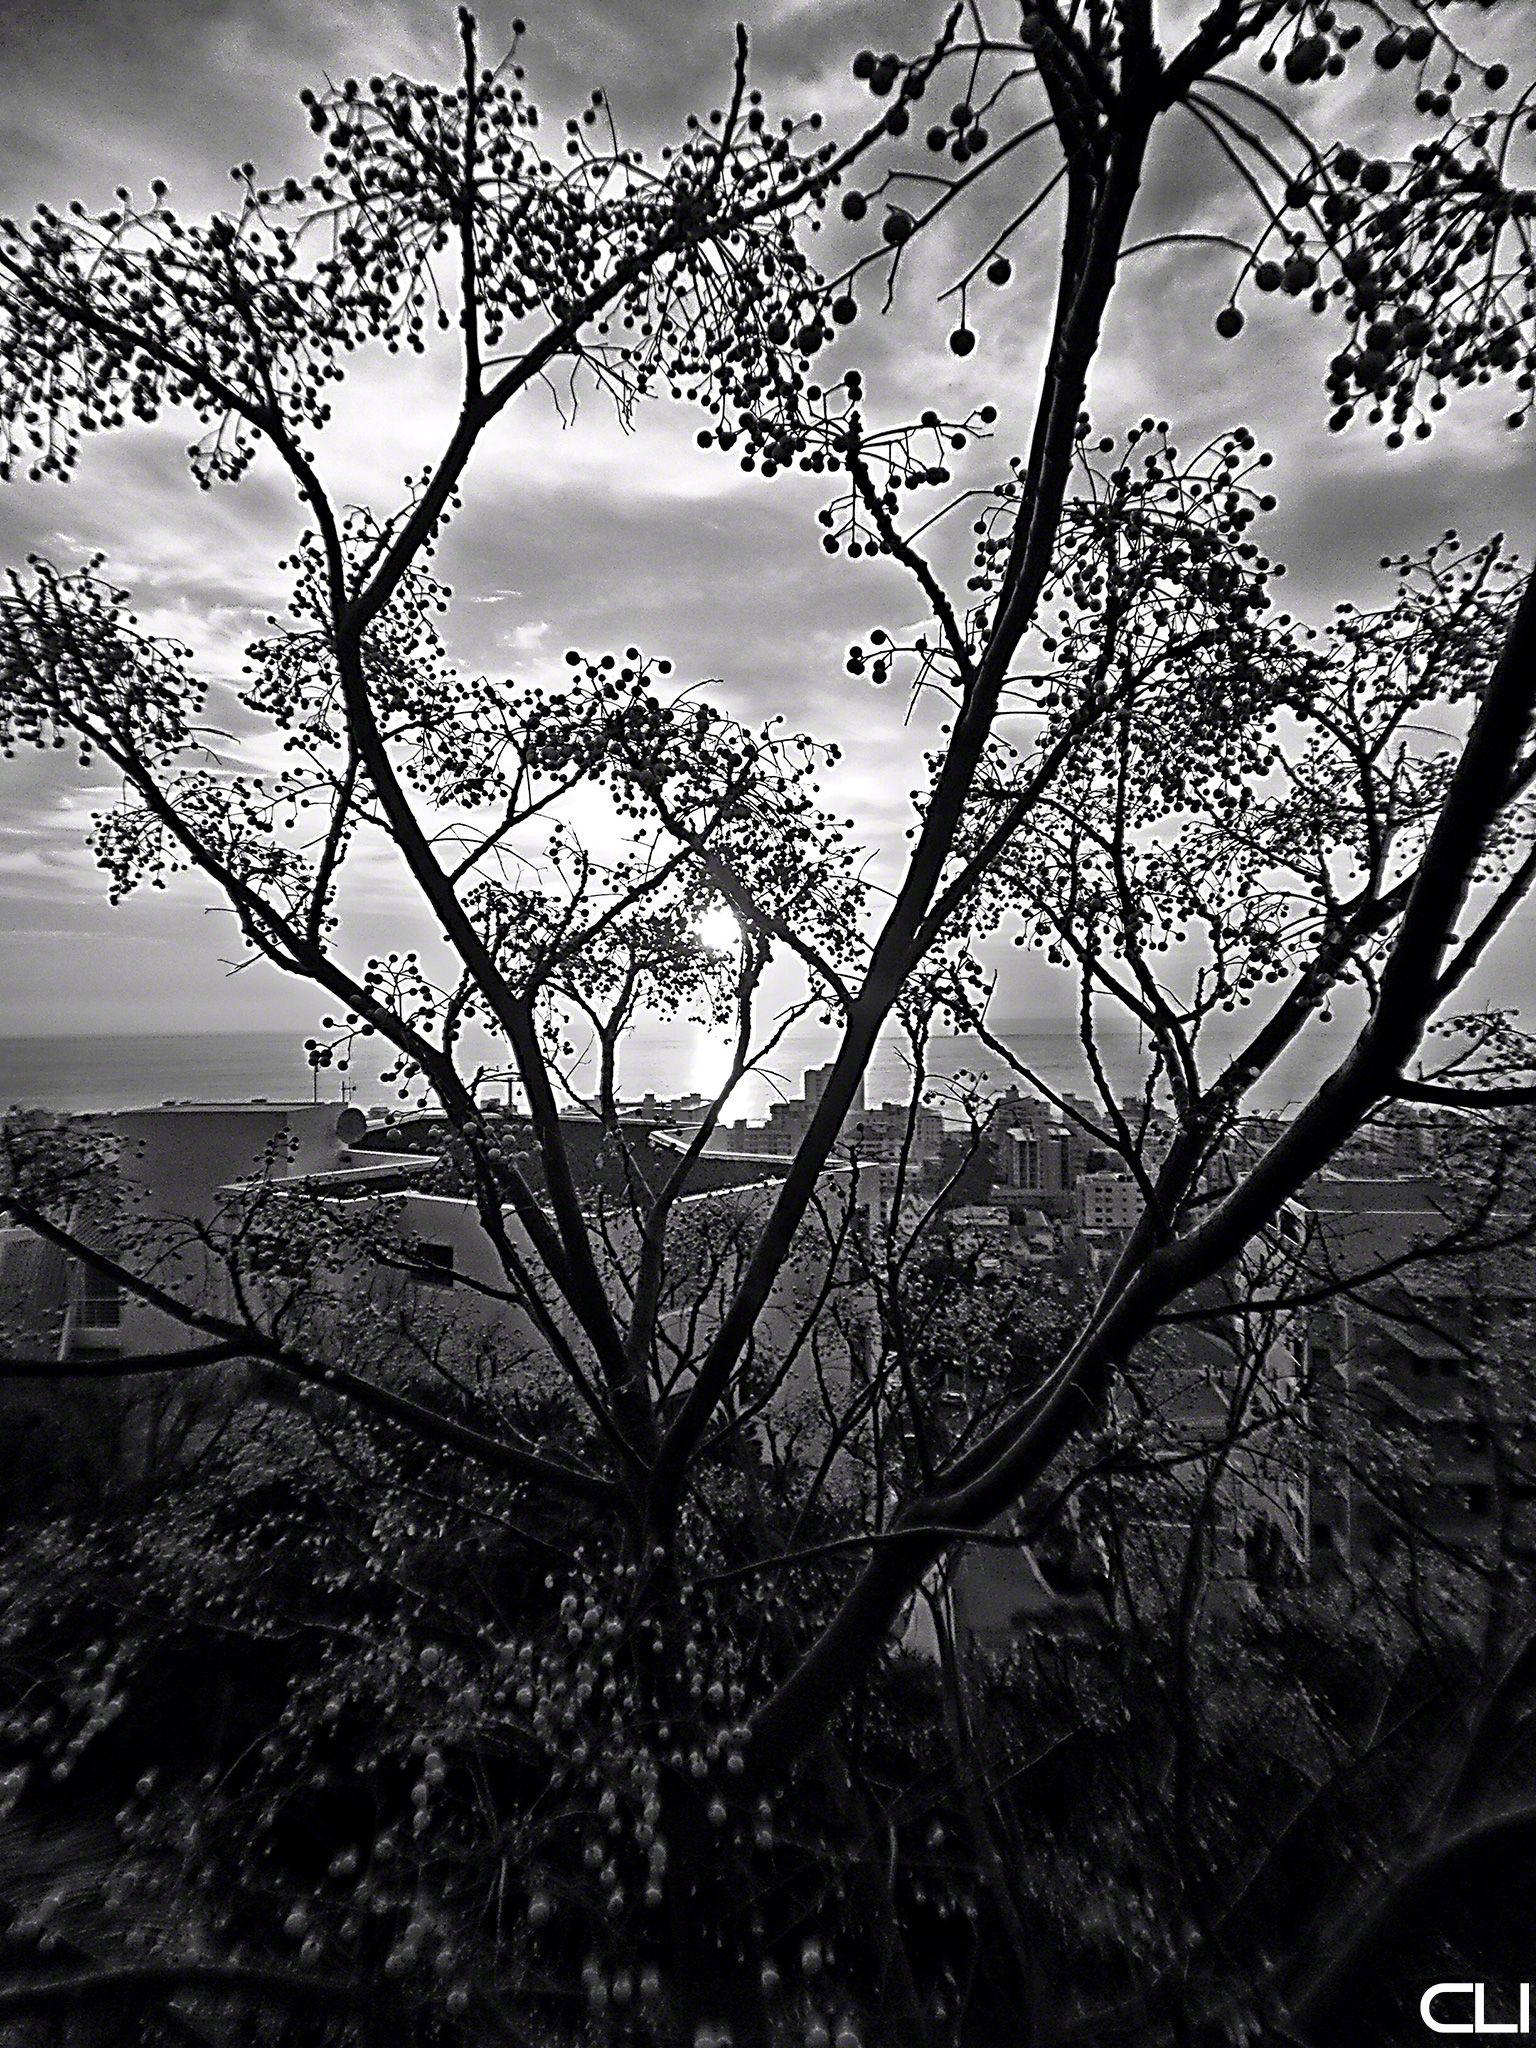 Atlantic Ocean, flats on the hillside, seen through native tree